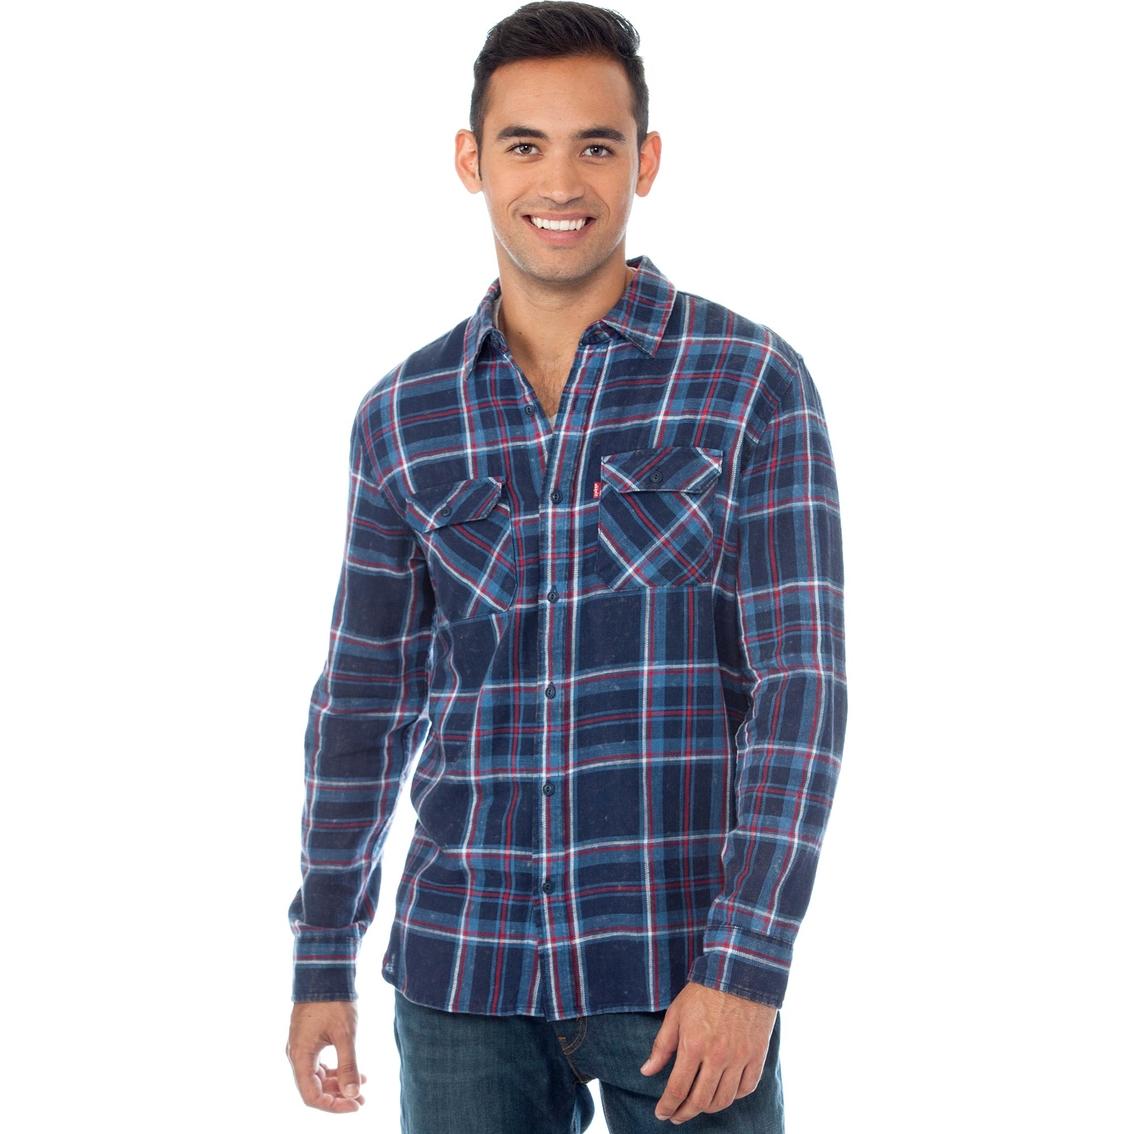 Levis Fulvio Slub Twill Shirt